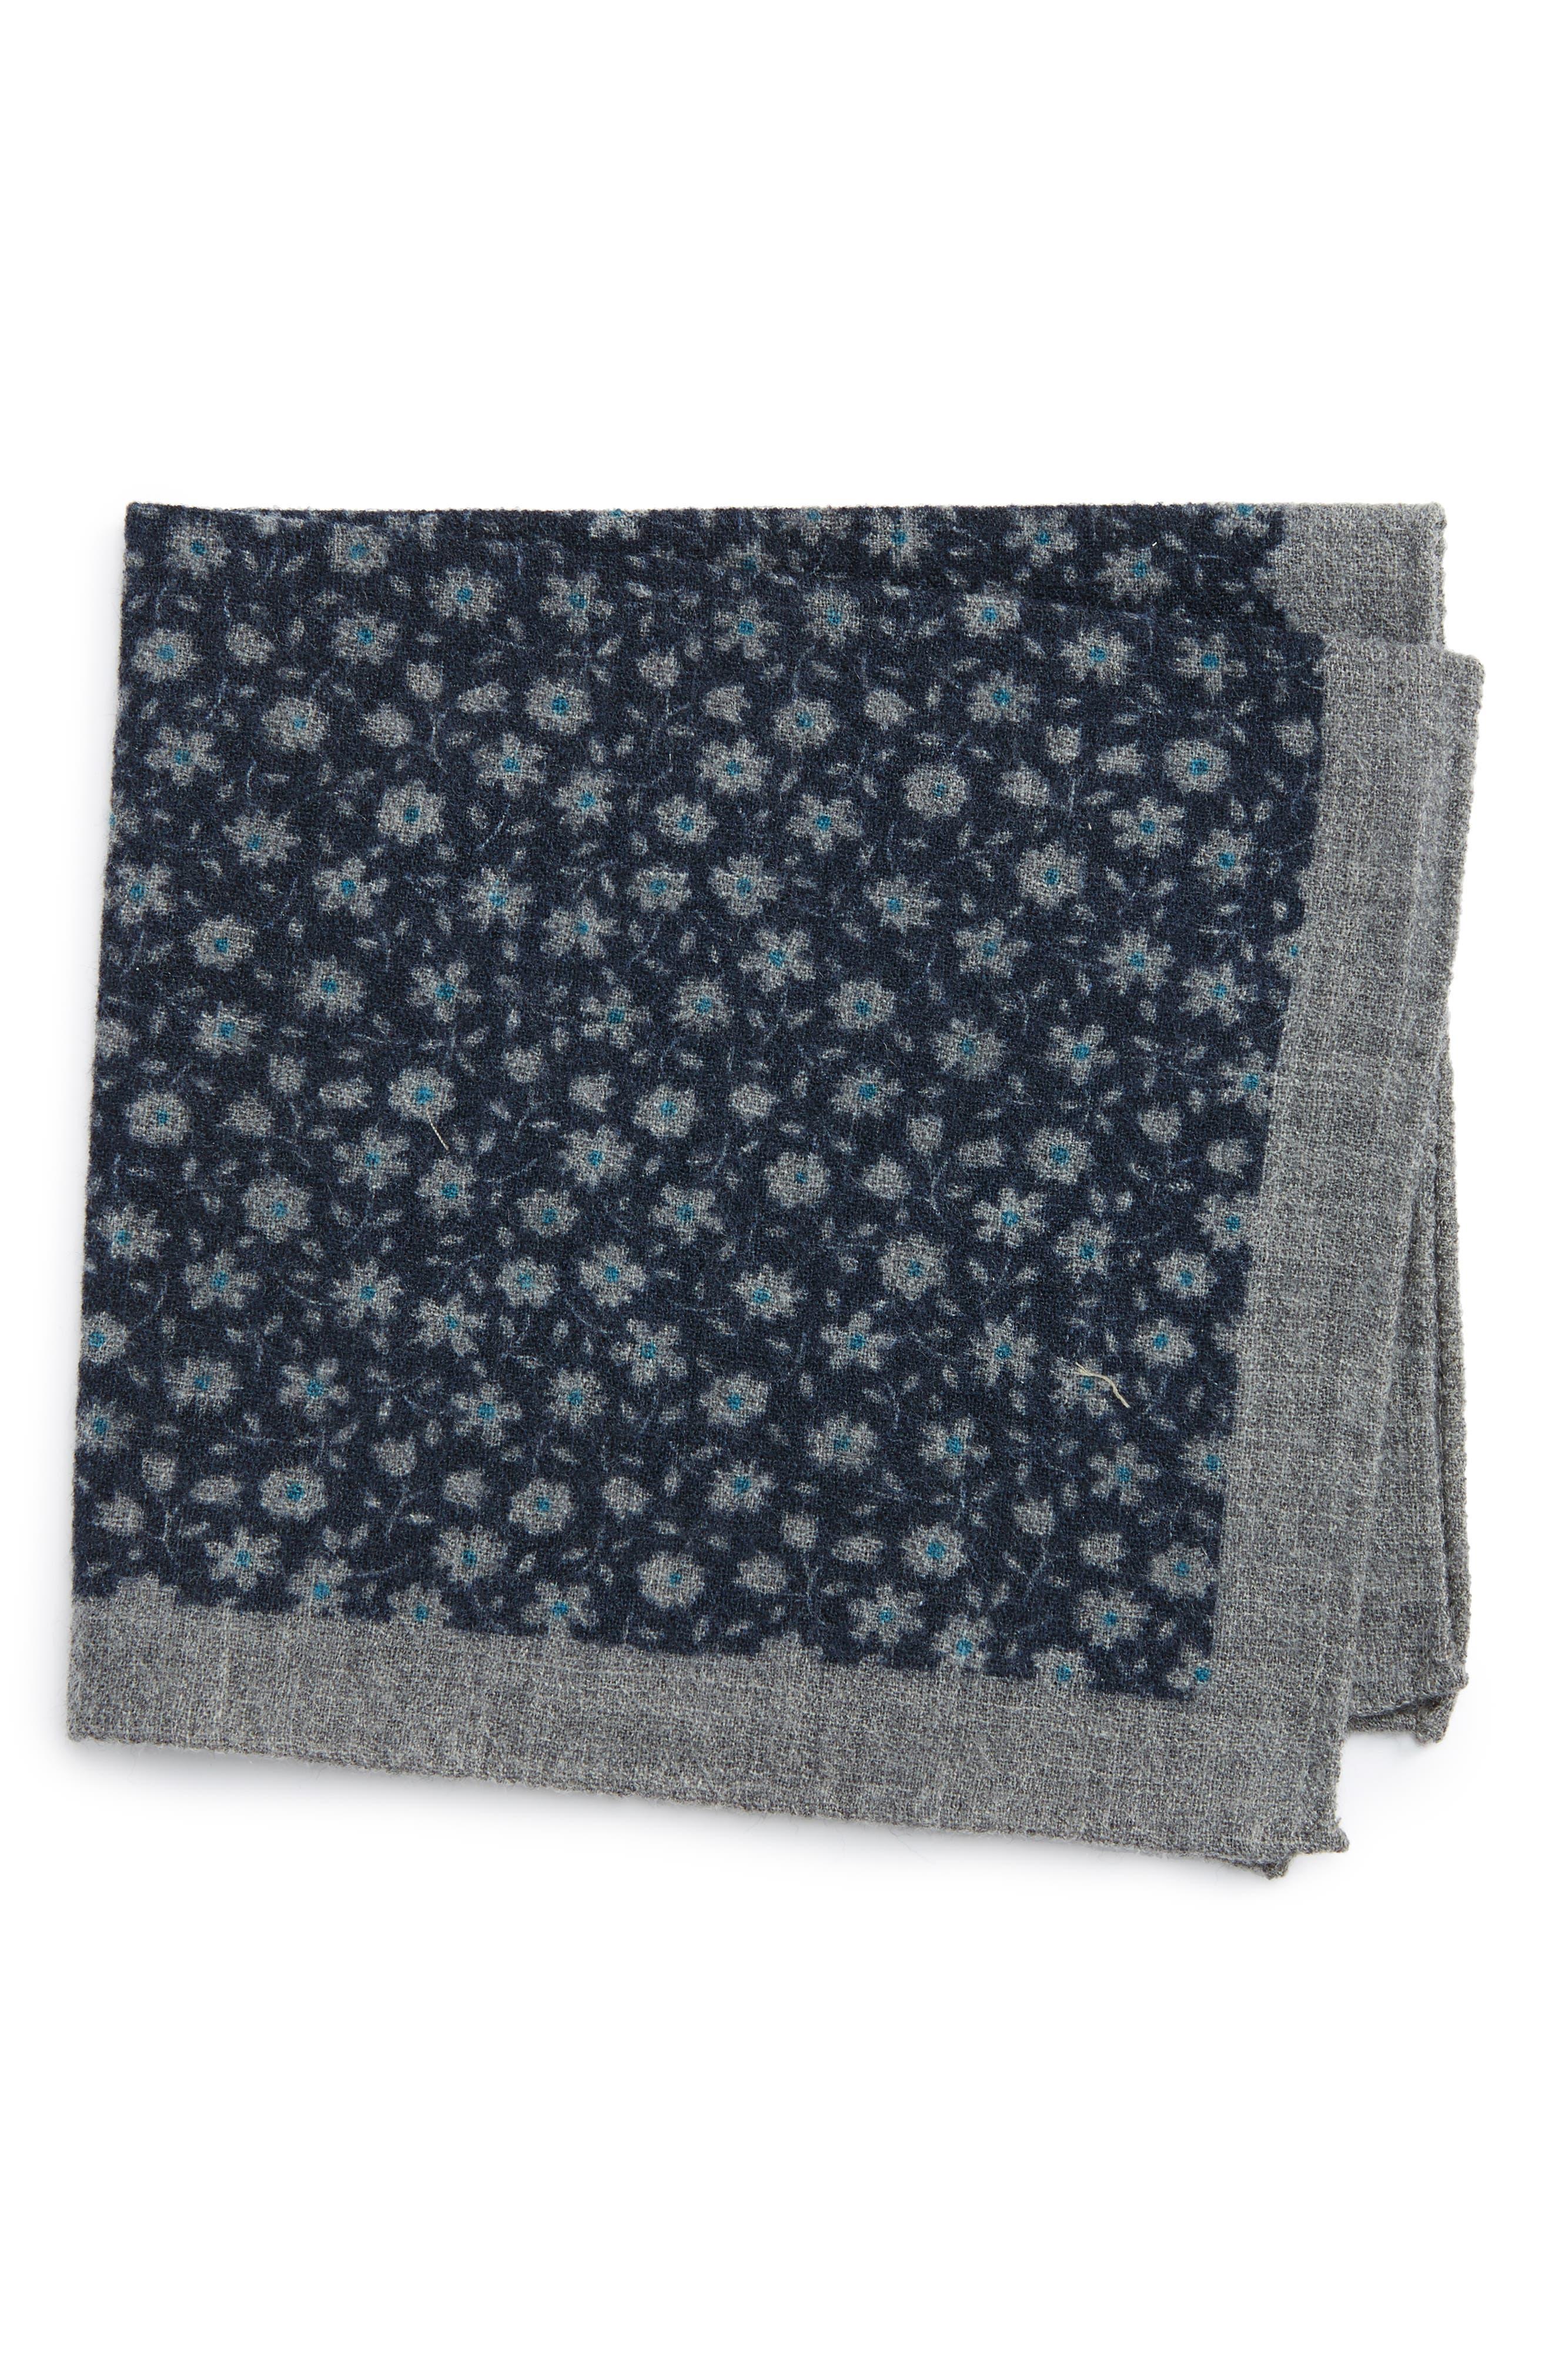 Alternate Image 1 Selected - Ted Baker London Patterned Wool Pocket Square